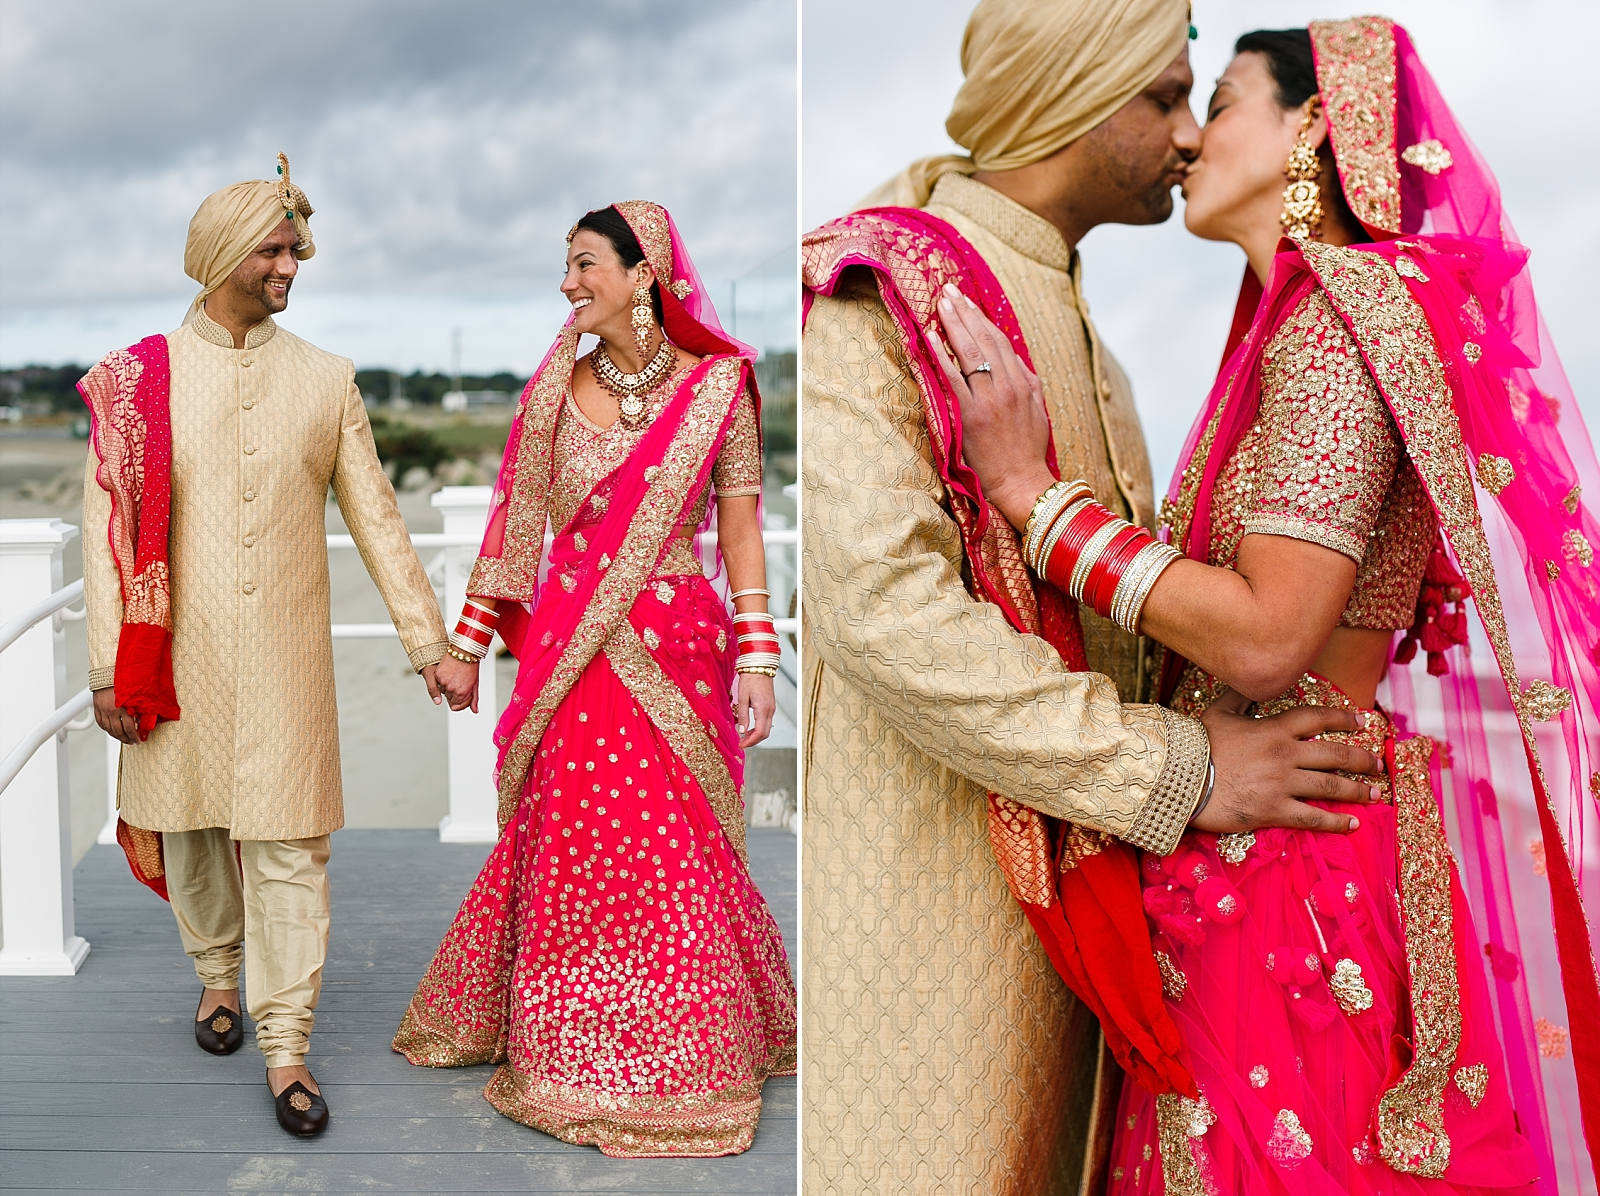 Newport_Wedding_Photographer_RaAj_Gallery_11.jpg